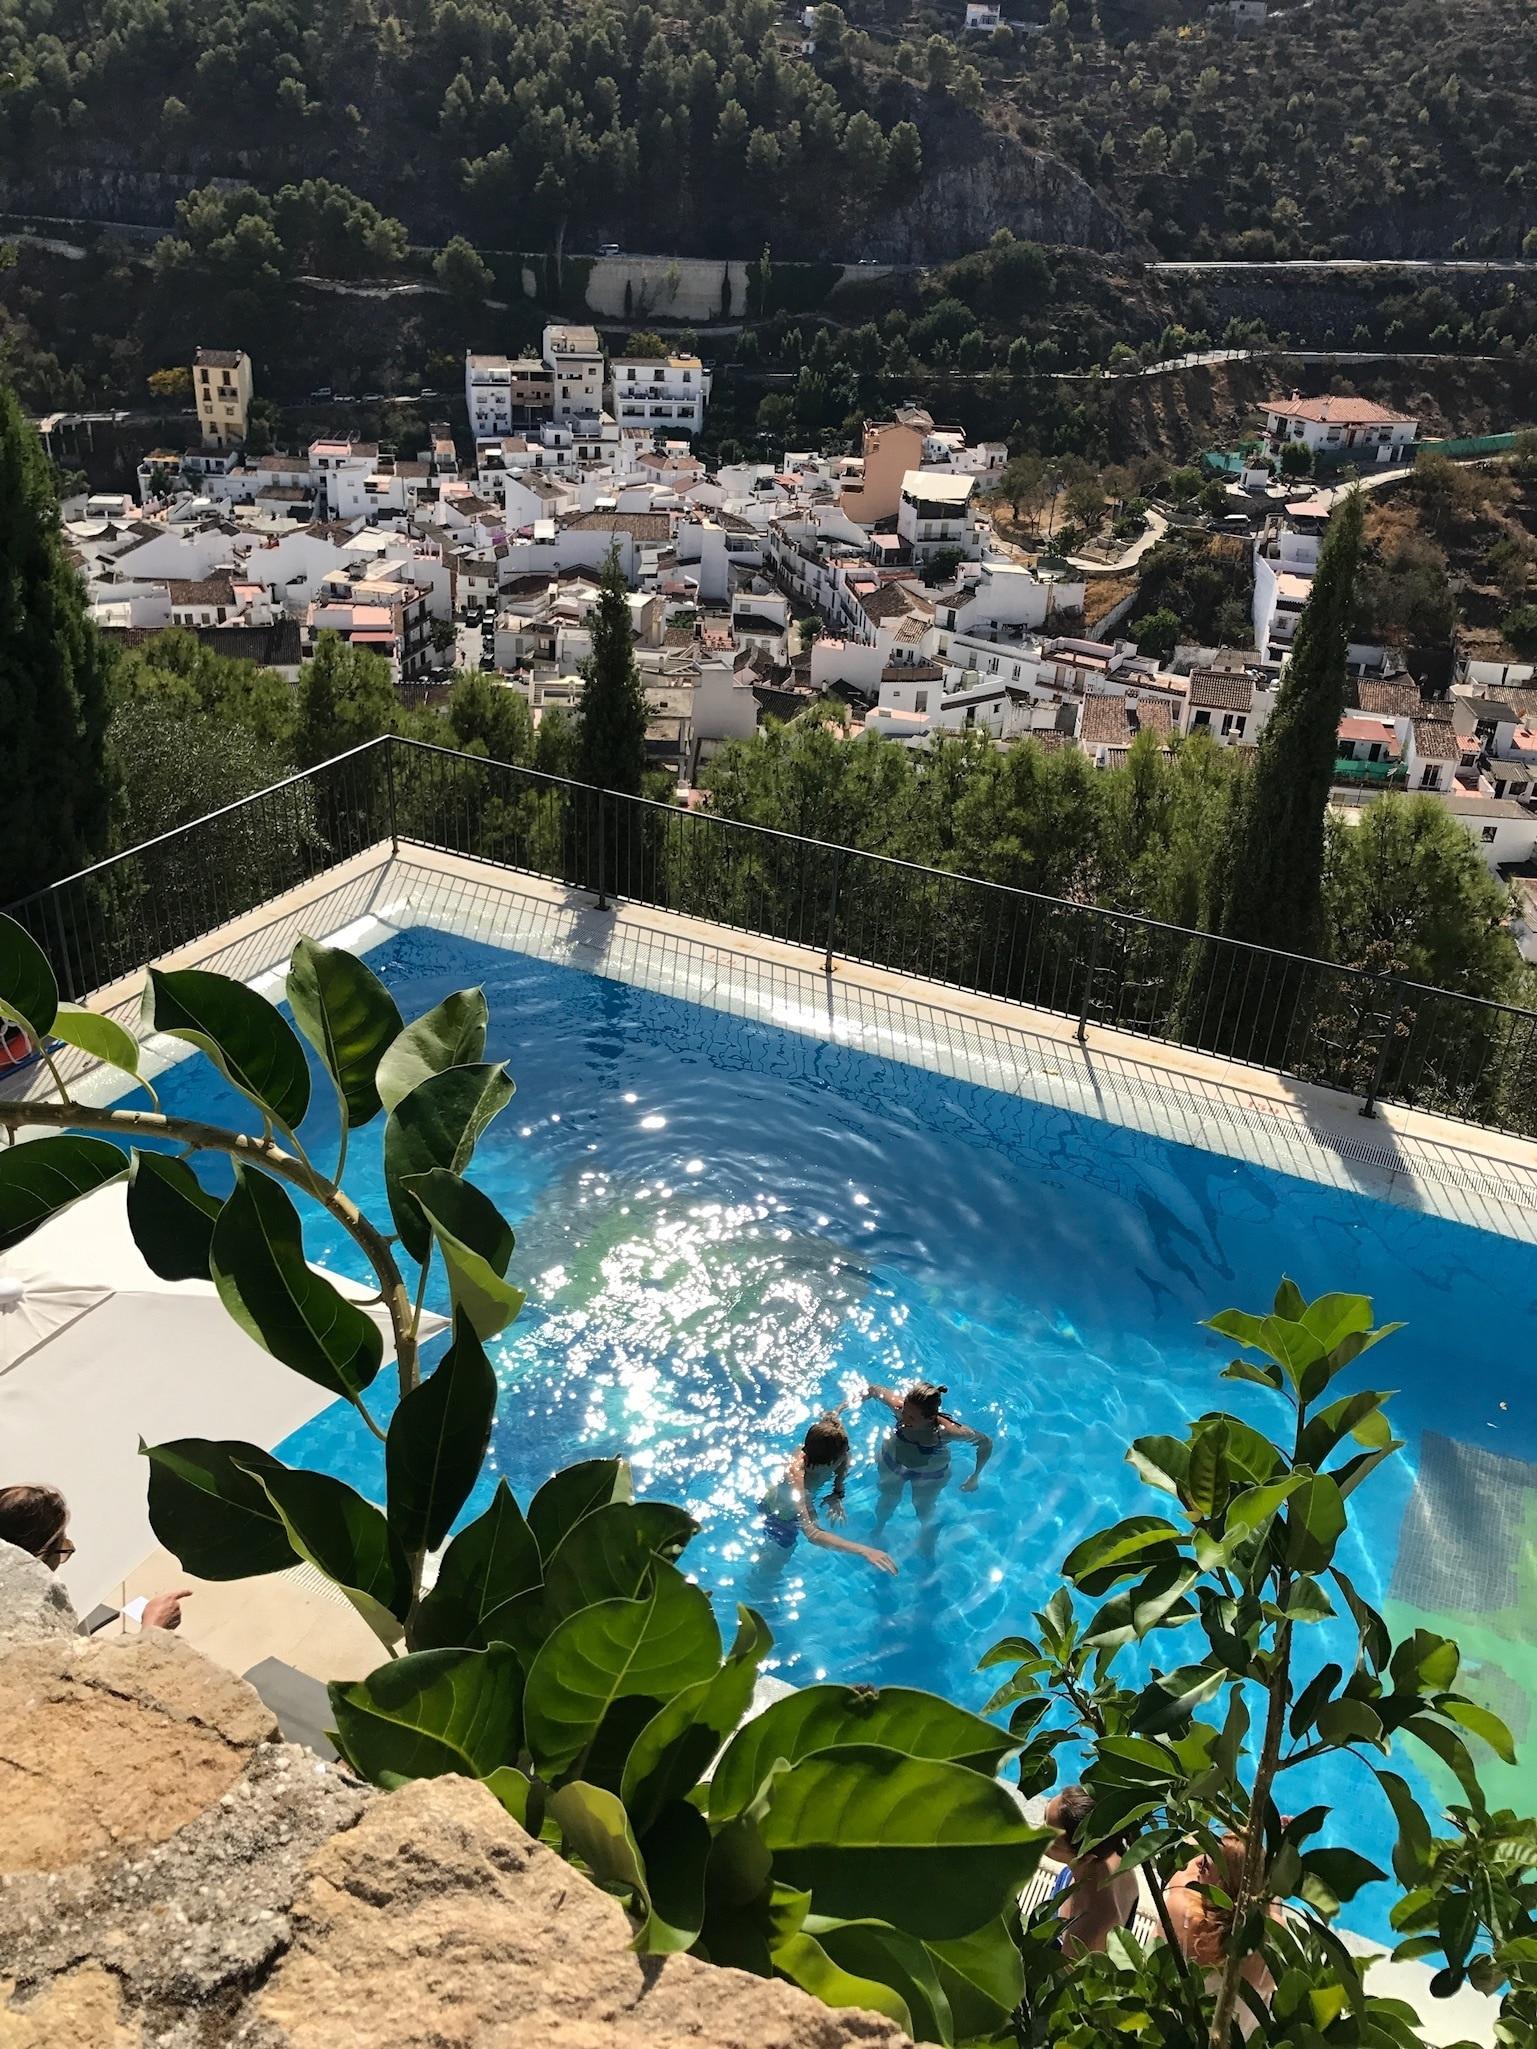 Monda, Andalusia, Spain